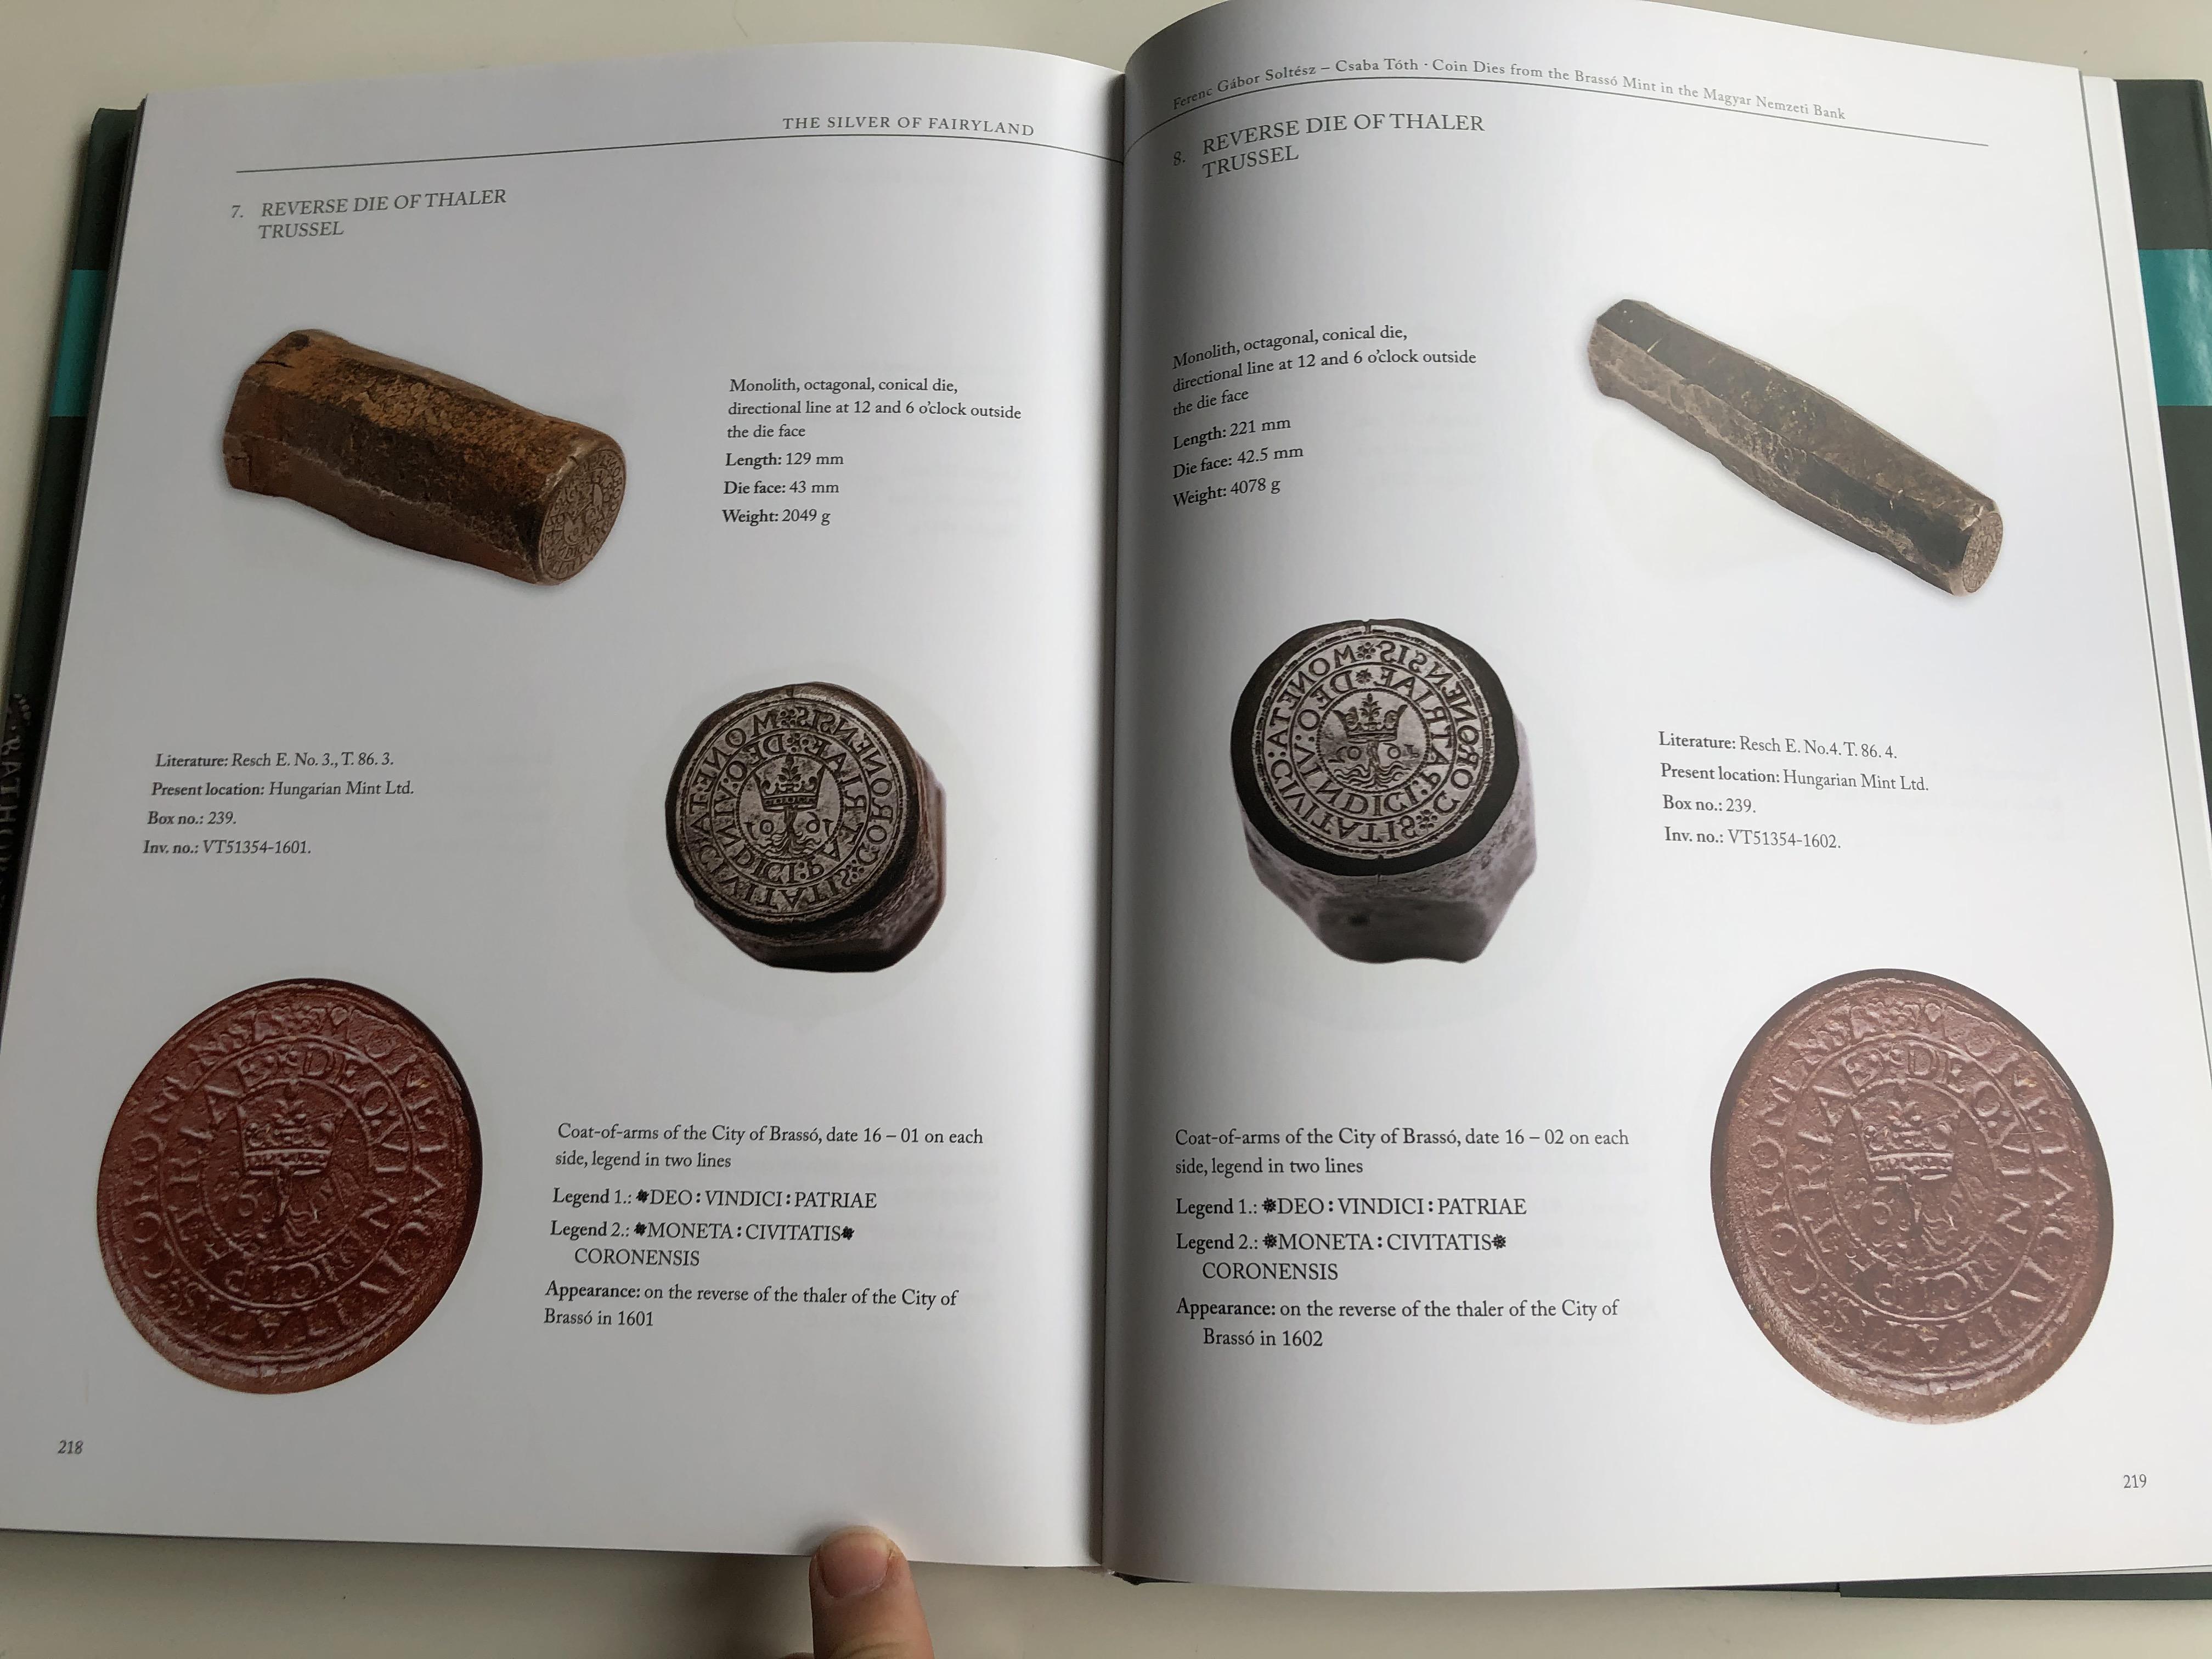 the-silver-of-fairyland-by-csaba-t-th-a-transylvanian-thaler-collection-in-the-magyar-nemzeti-bank-22.jpg